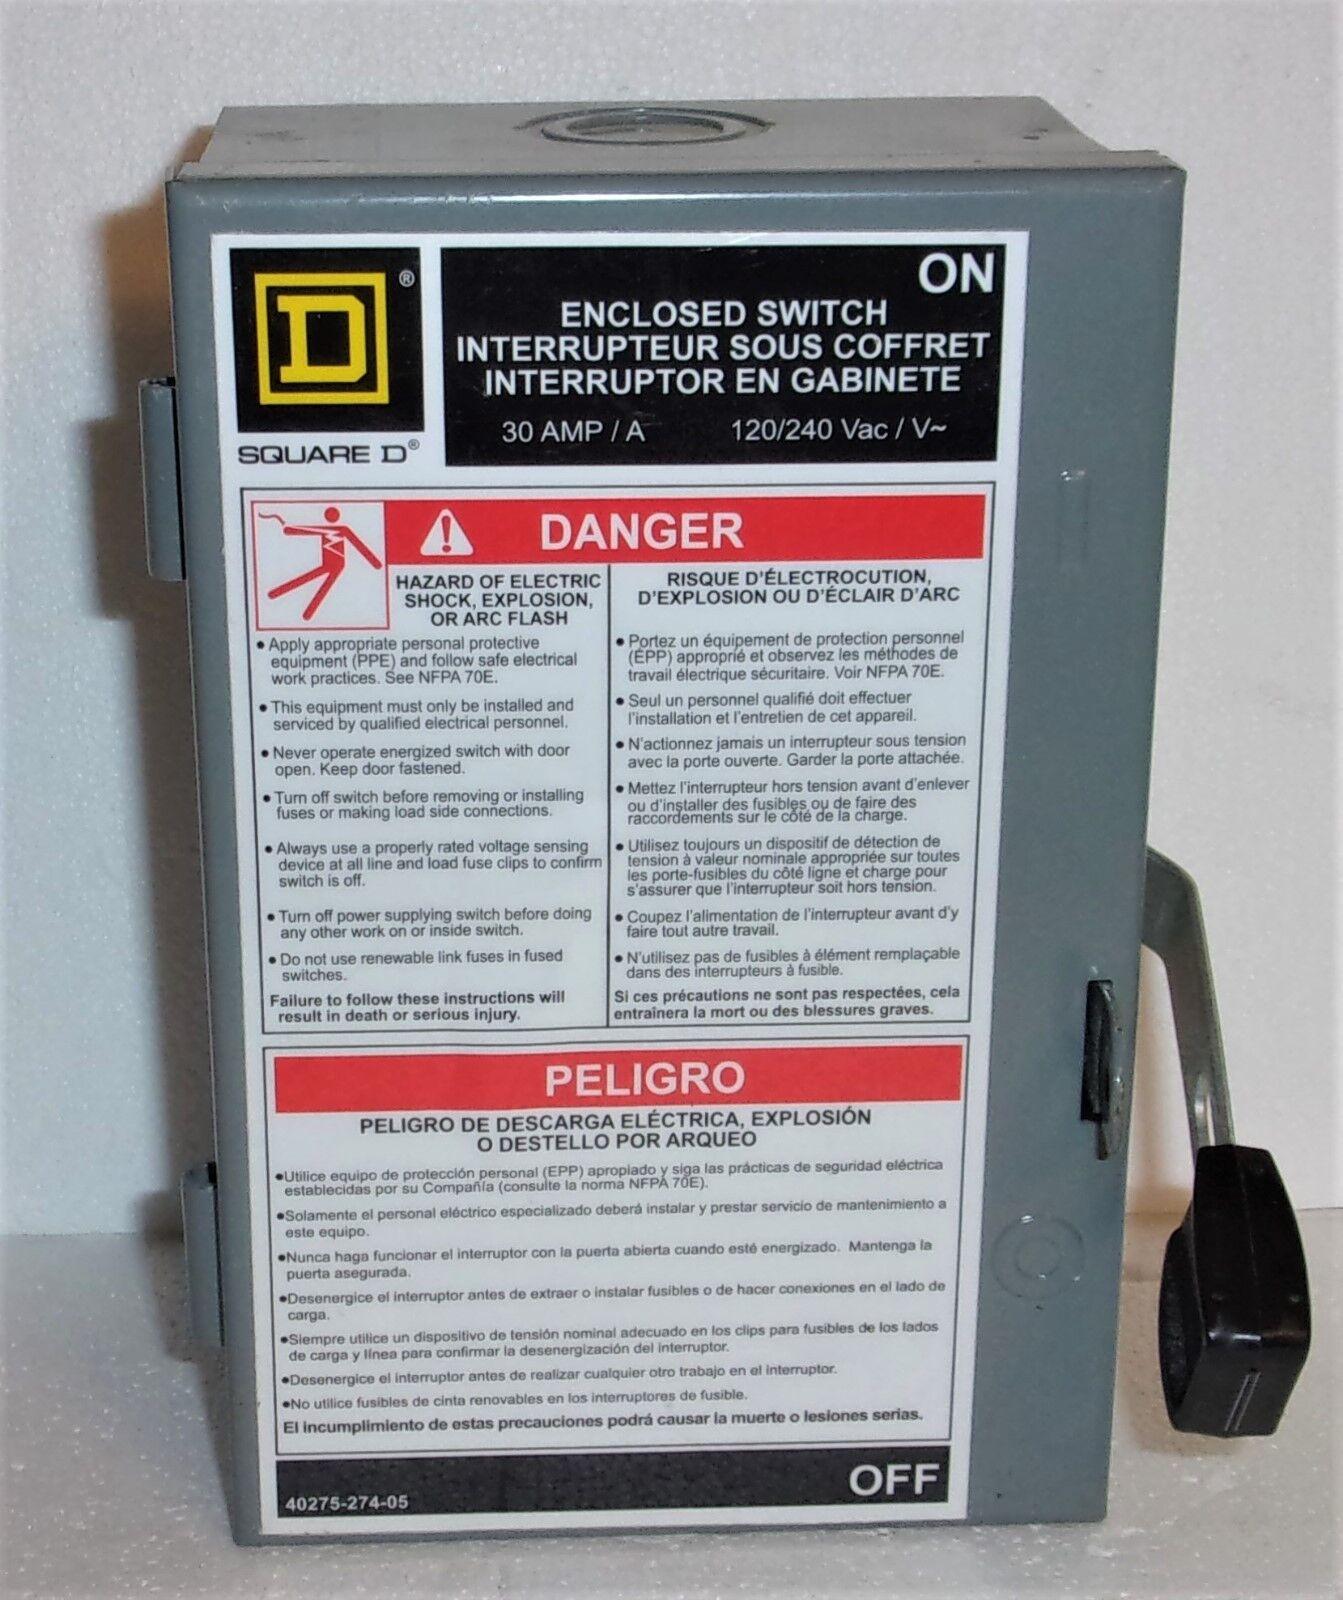 square d 30 amp fused 40275 274 05 enclosed switch 120 240vac